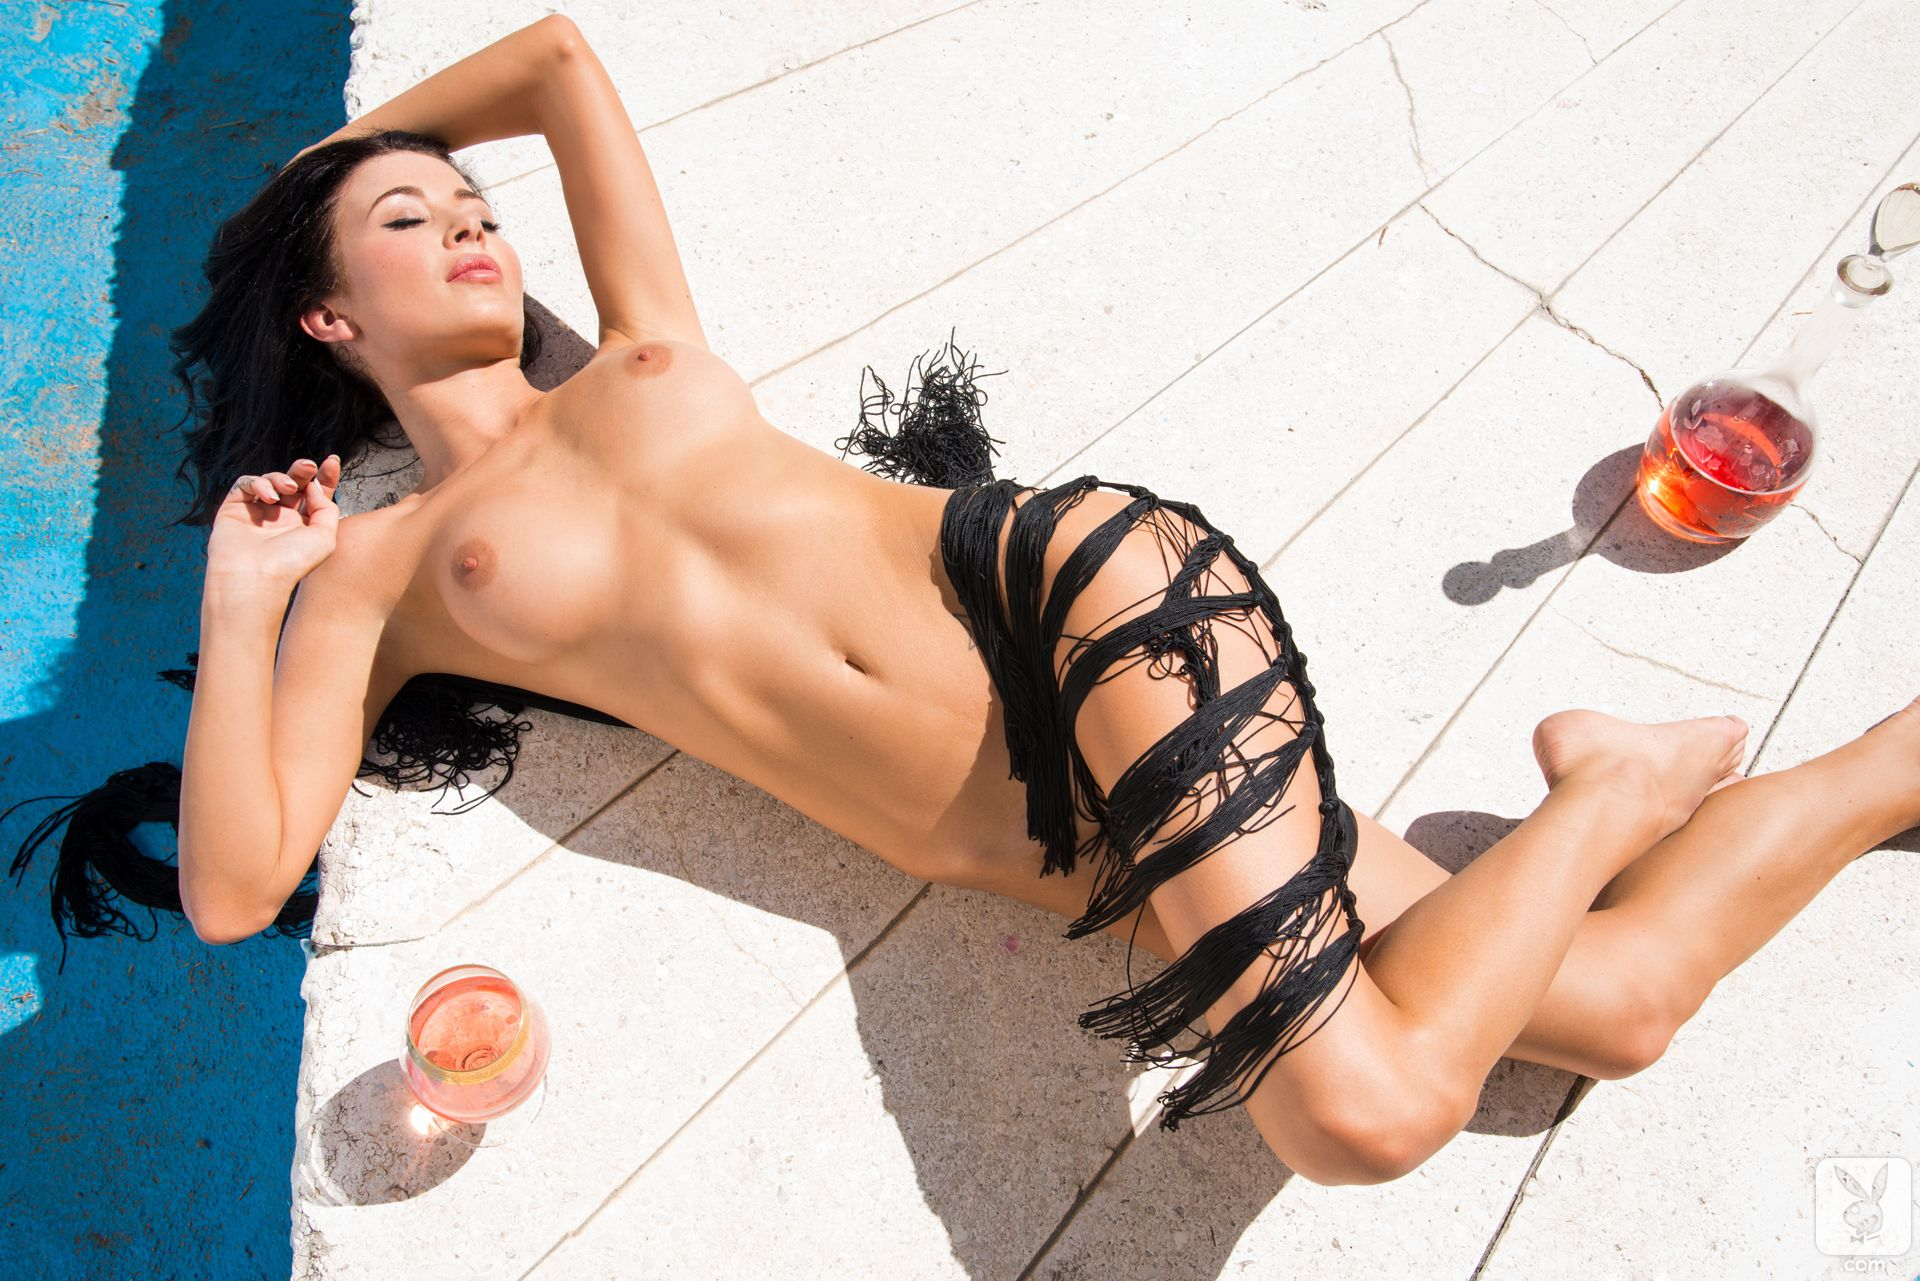 Gemma Lee Farrell Nude Minimalist gemma lee farrell - playboy | gemma lee farrell | pinterest